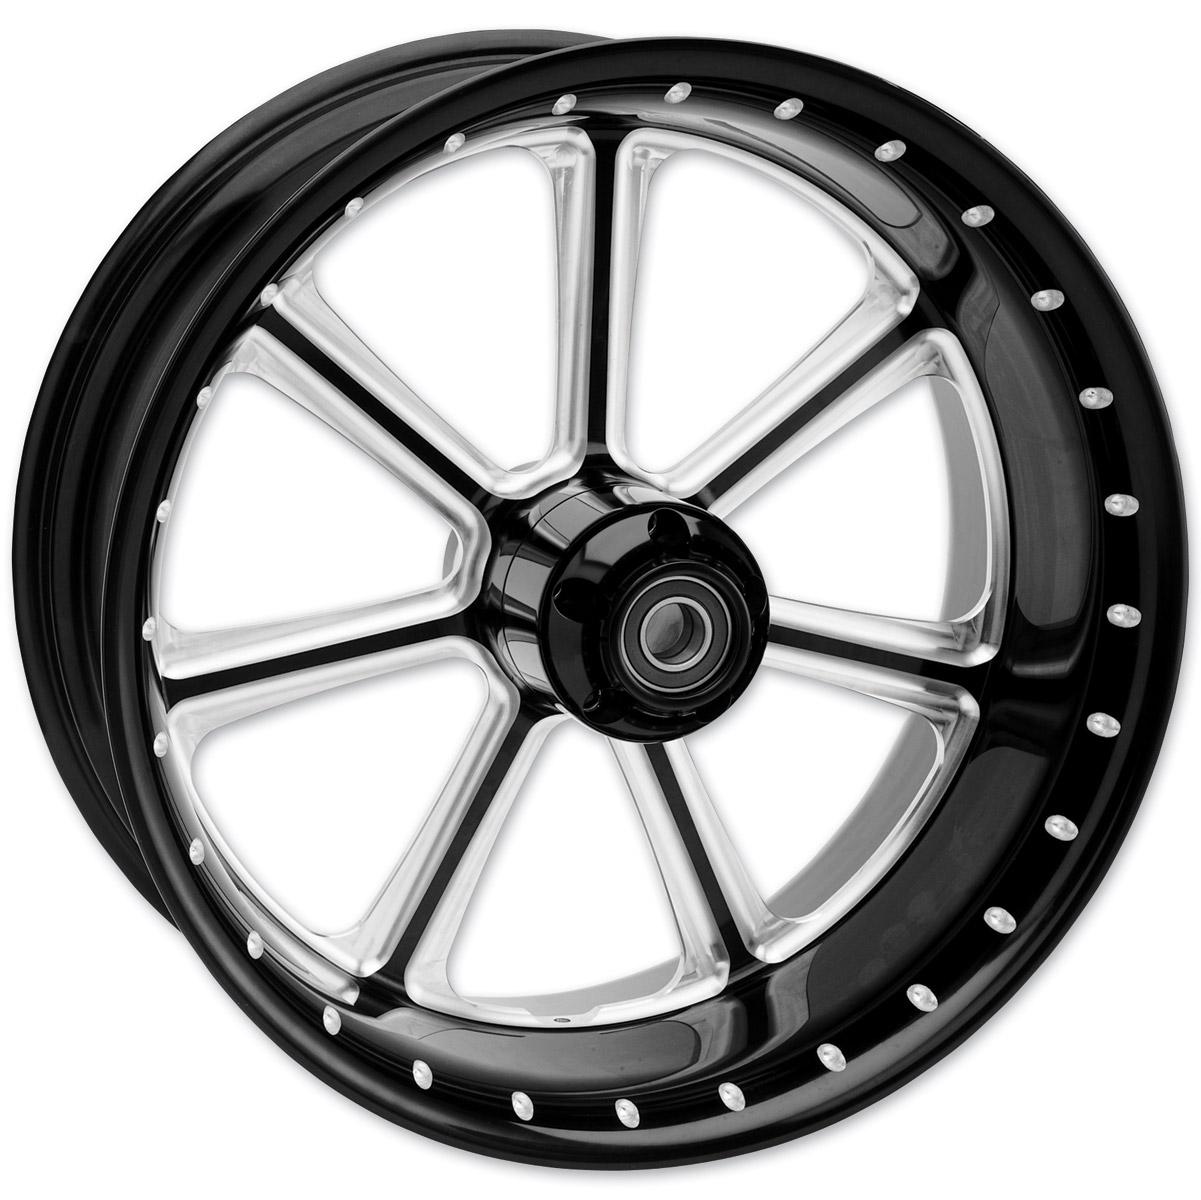 Roland Sands Design Contrast Cut Diesel Rear Wheel, 17 x 6